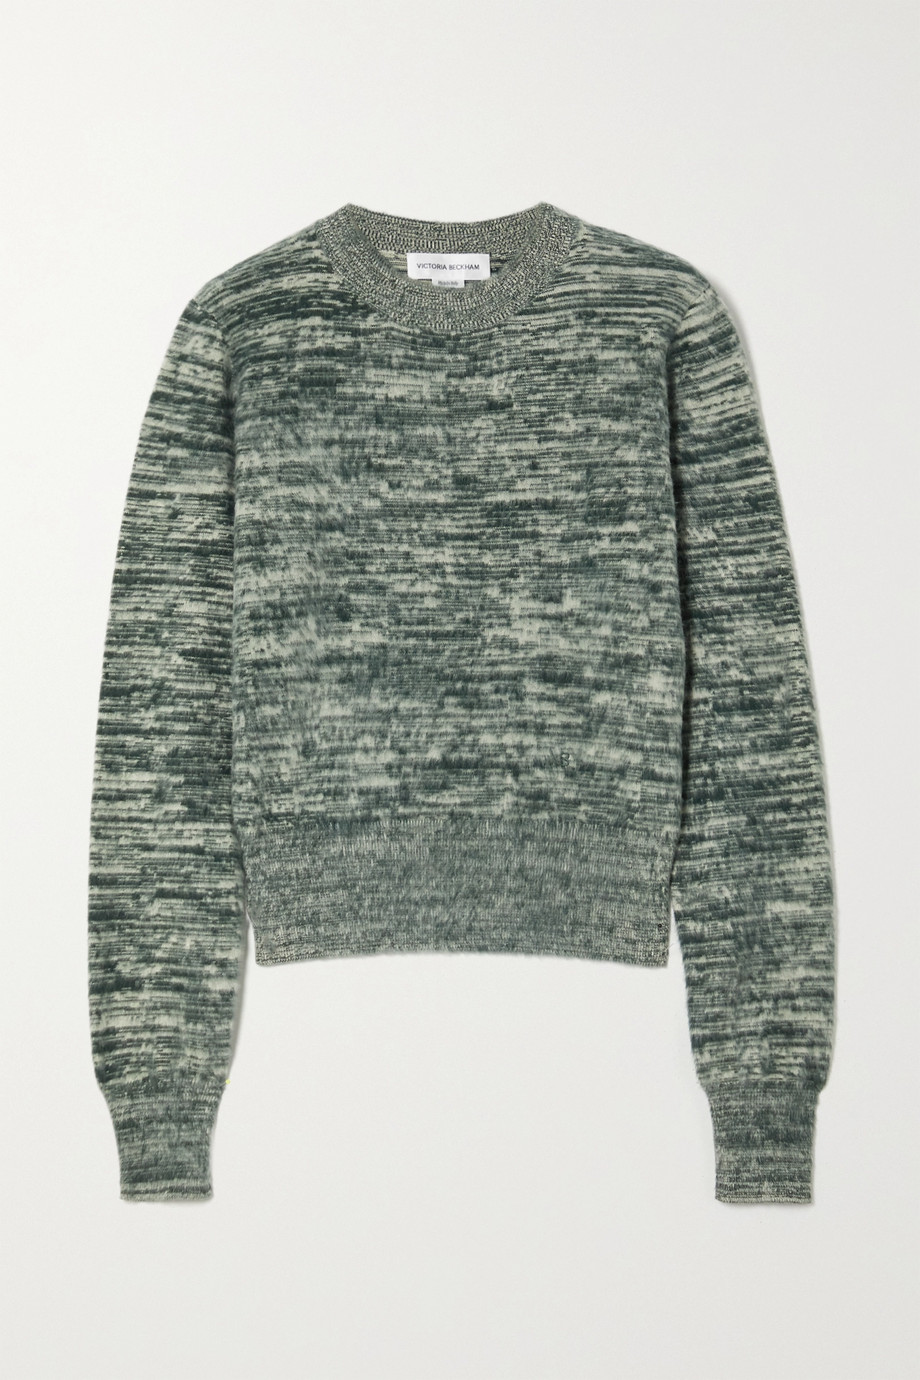 Victoria Beckham Mélange brushed-cotton sweater